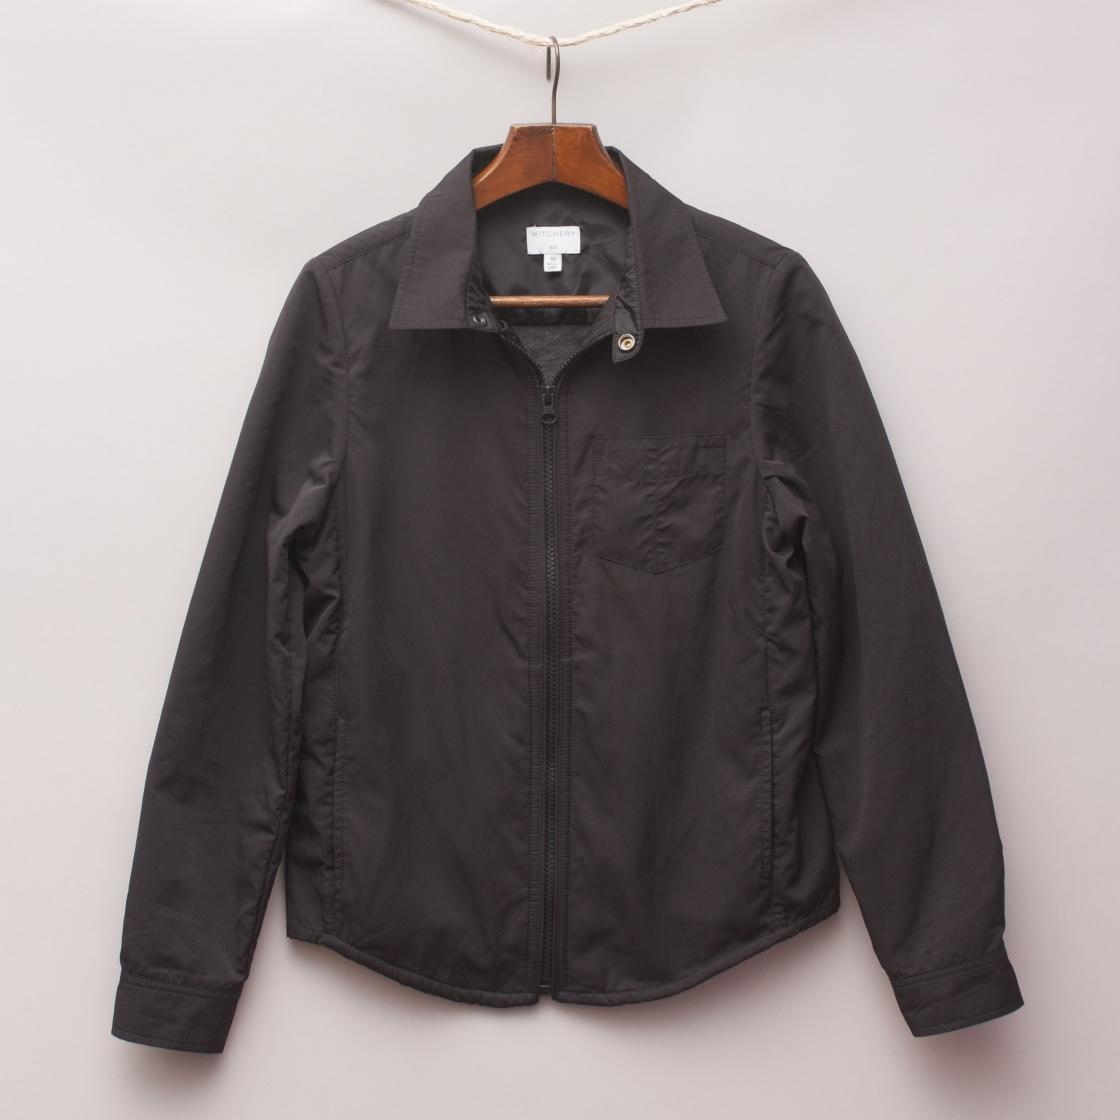 Witchery Black Jacket